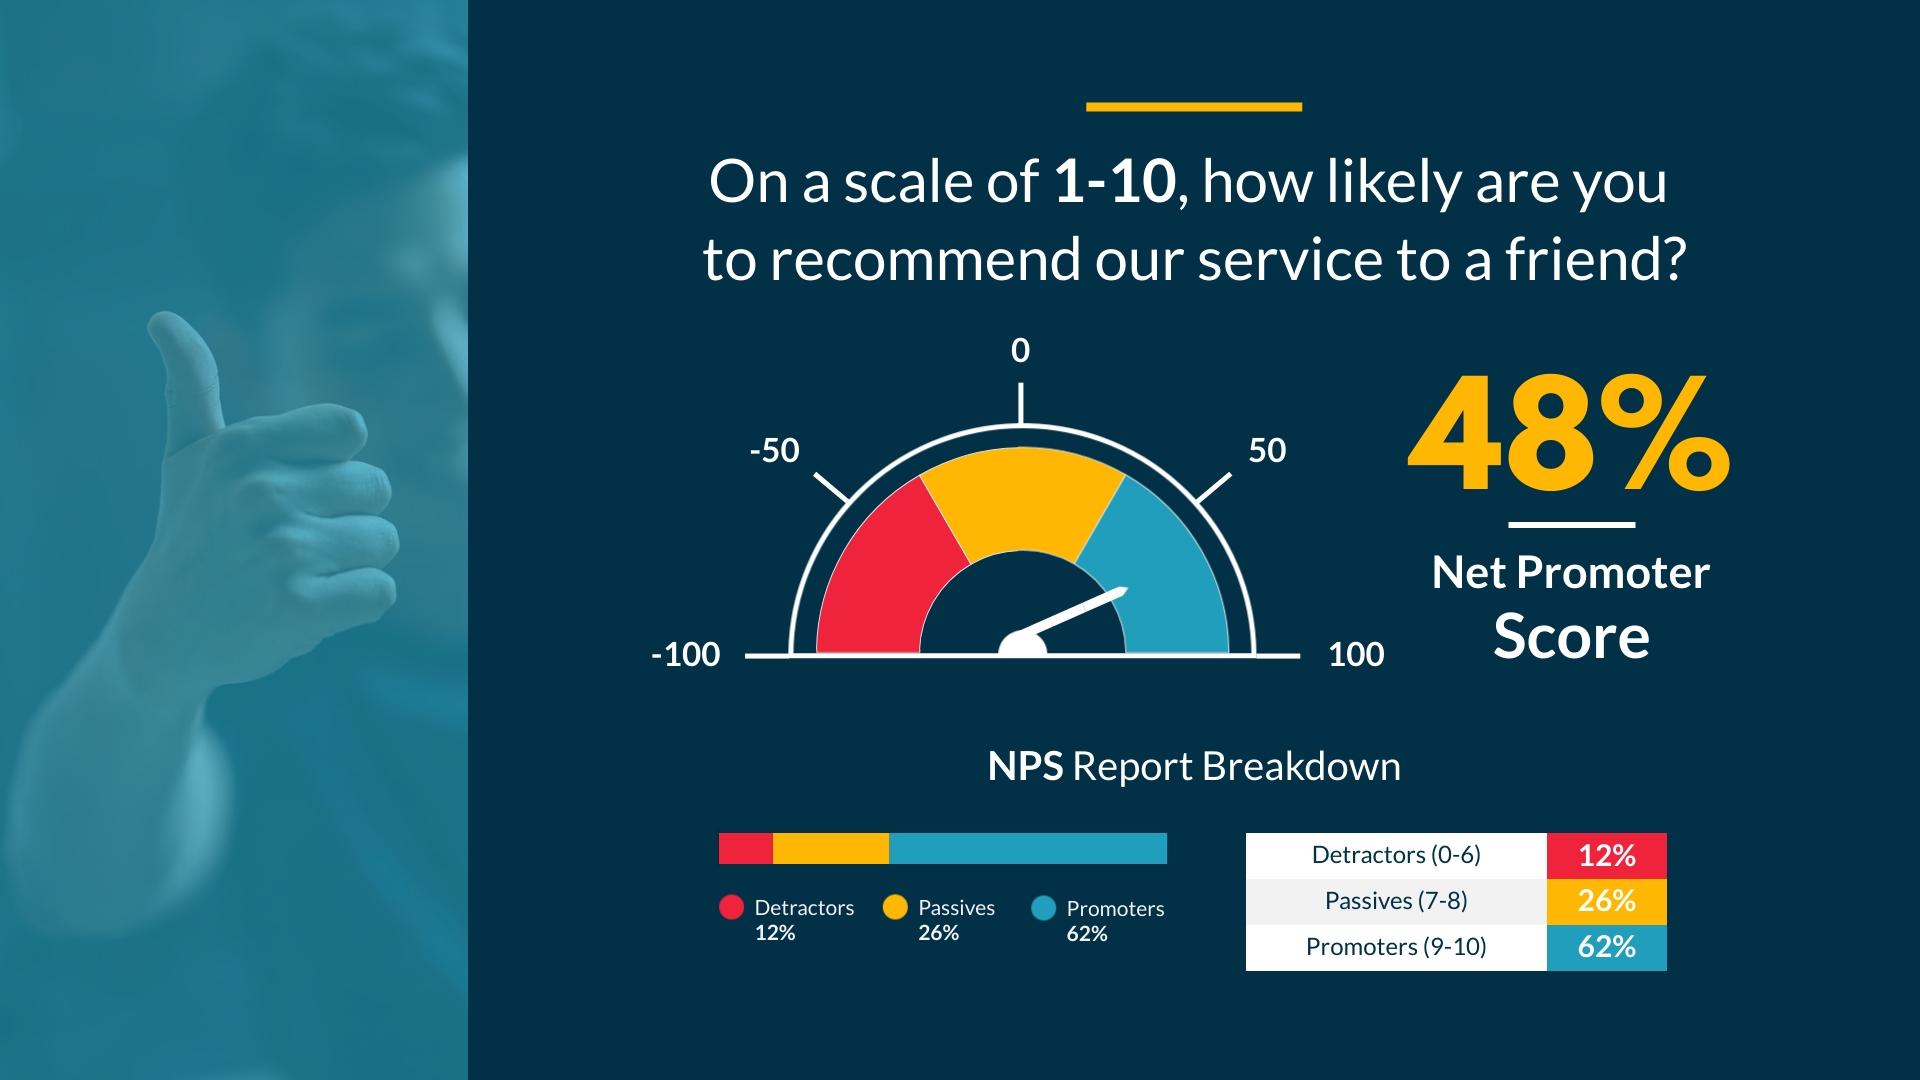 Net Promoter Score - Gauge Chart Template